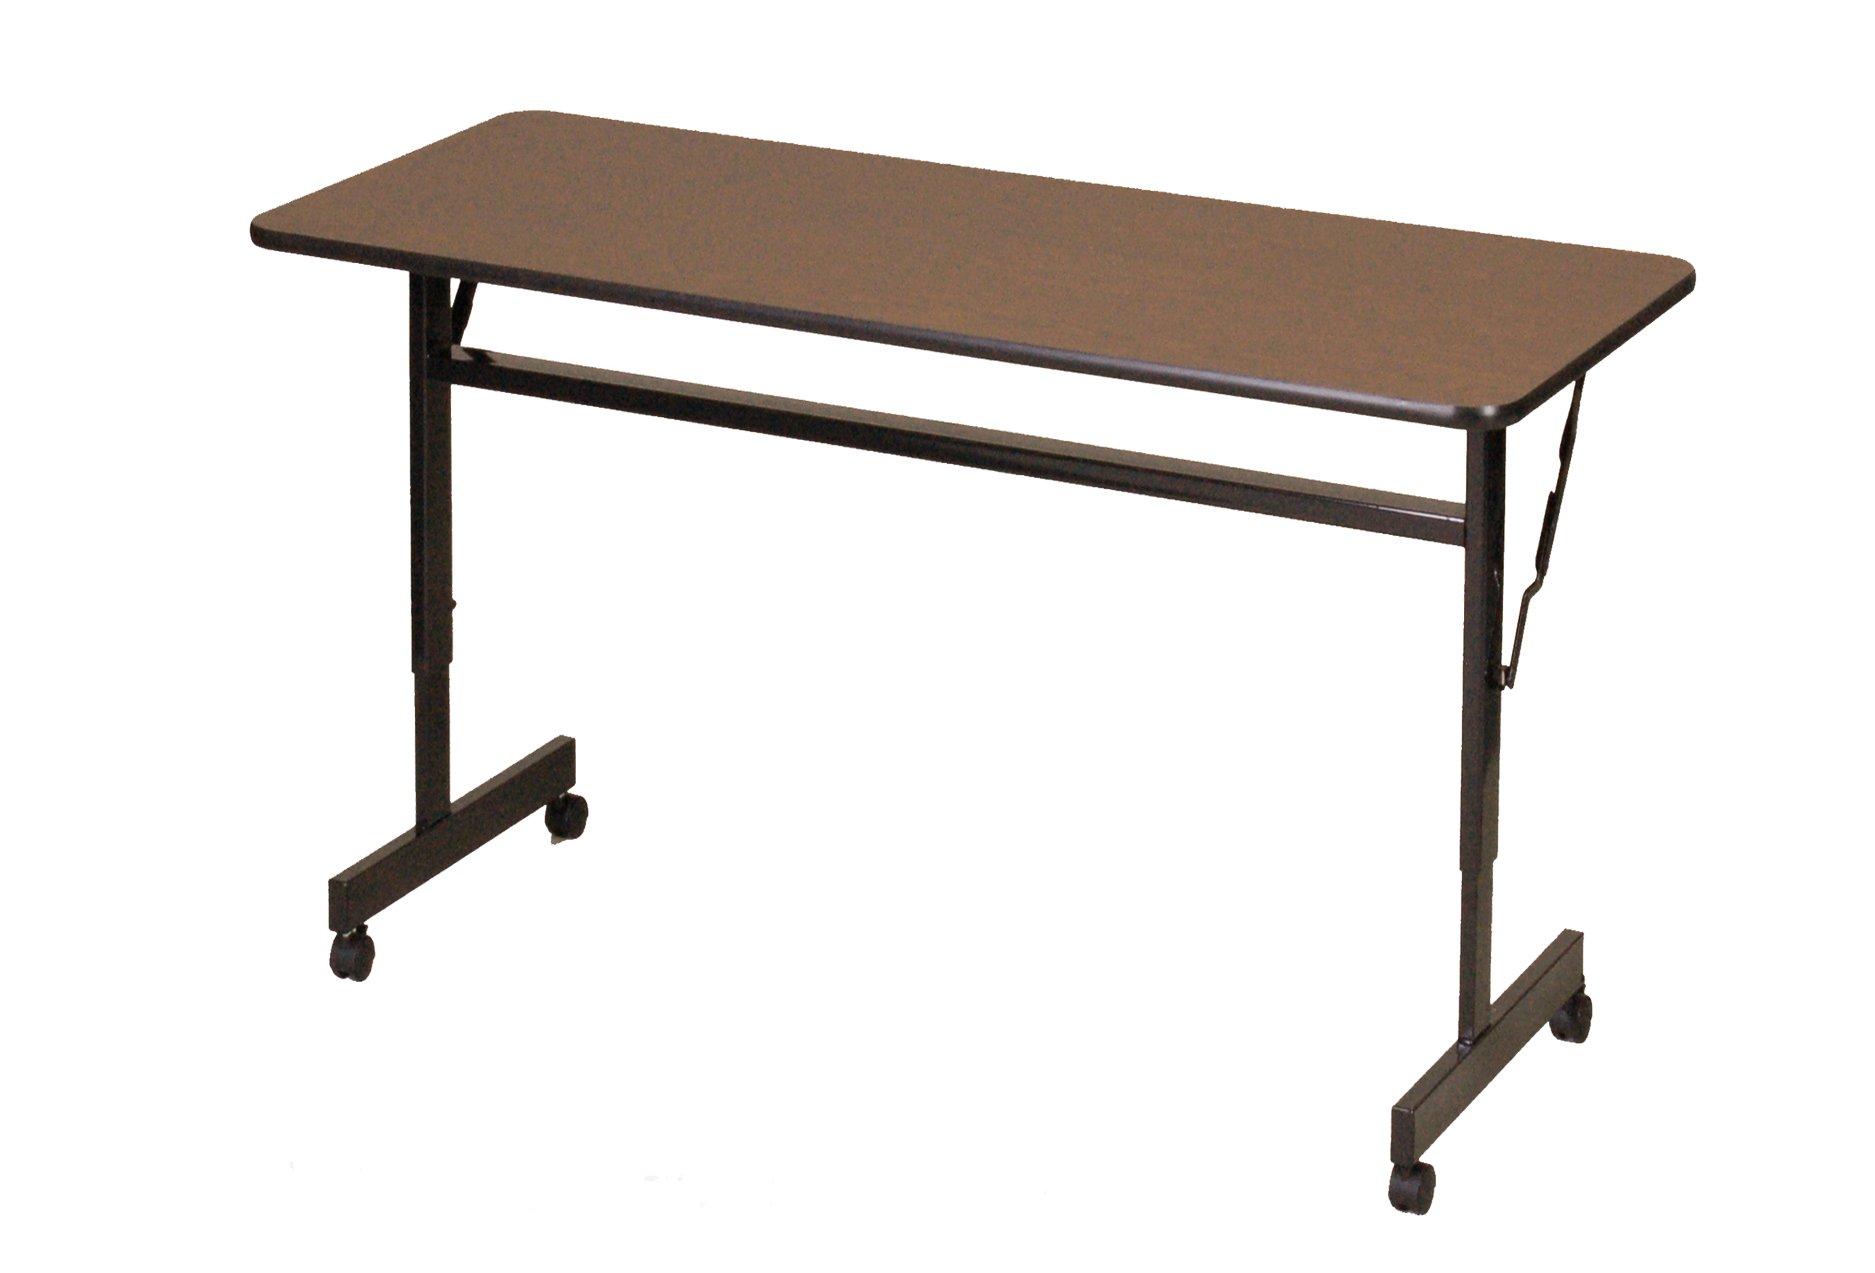 Correll FT2448M-01 EconoLine Flip Top Table, 24'' x 48'', Adjustable Height, Walnut Melamine Top, Rectangle, Seats 2